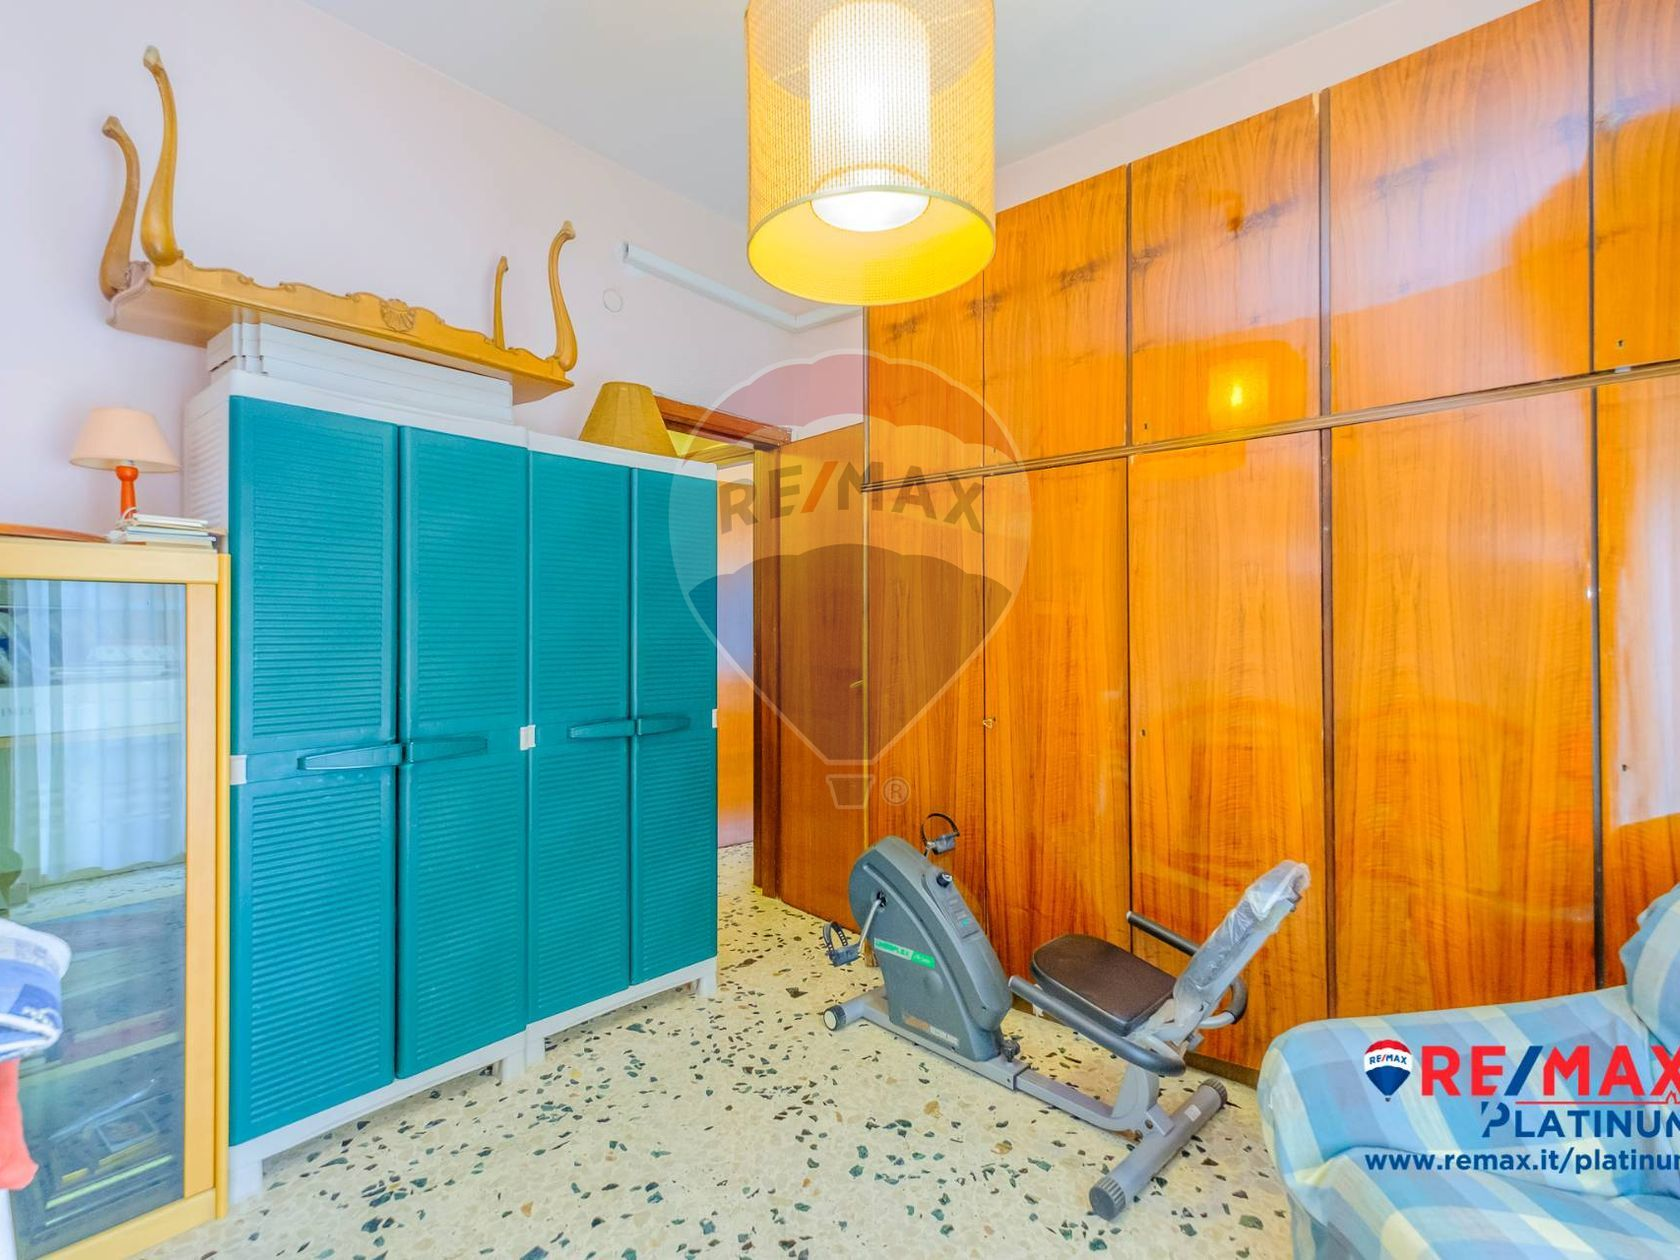 Appartamento Siracusa- Scala Greca S. Panagia Teracati Zecchino, Siracusa, SR Vendita - Foto 28